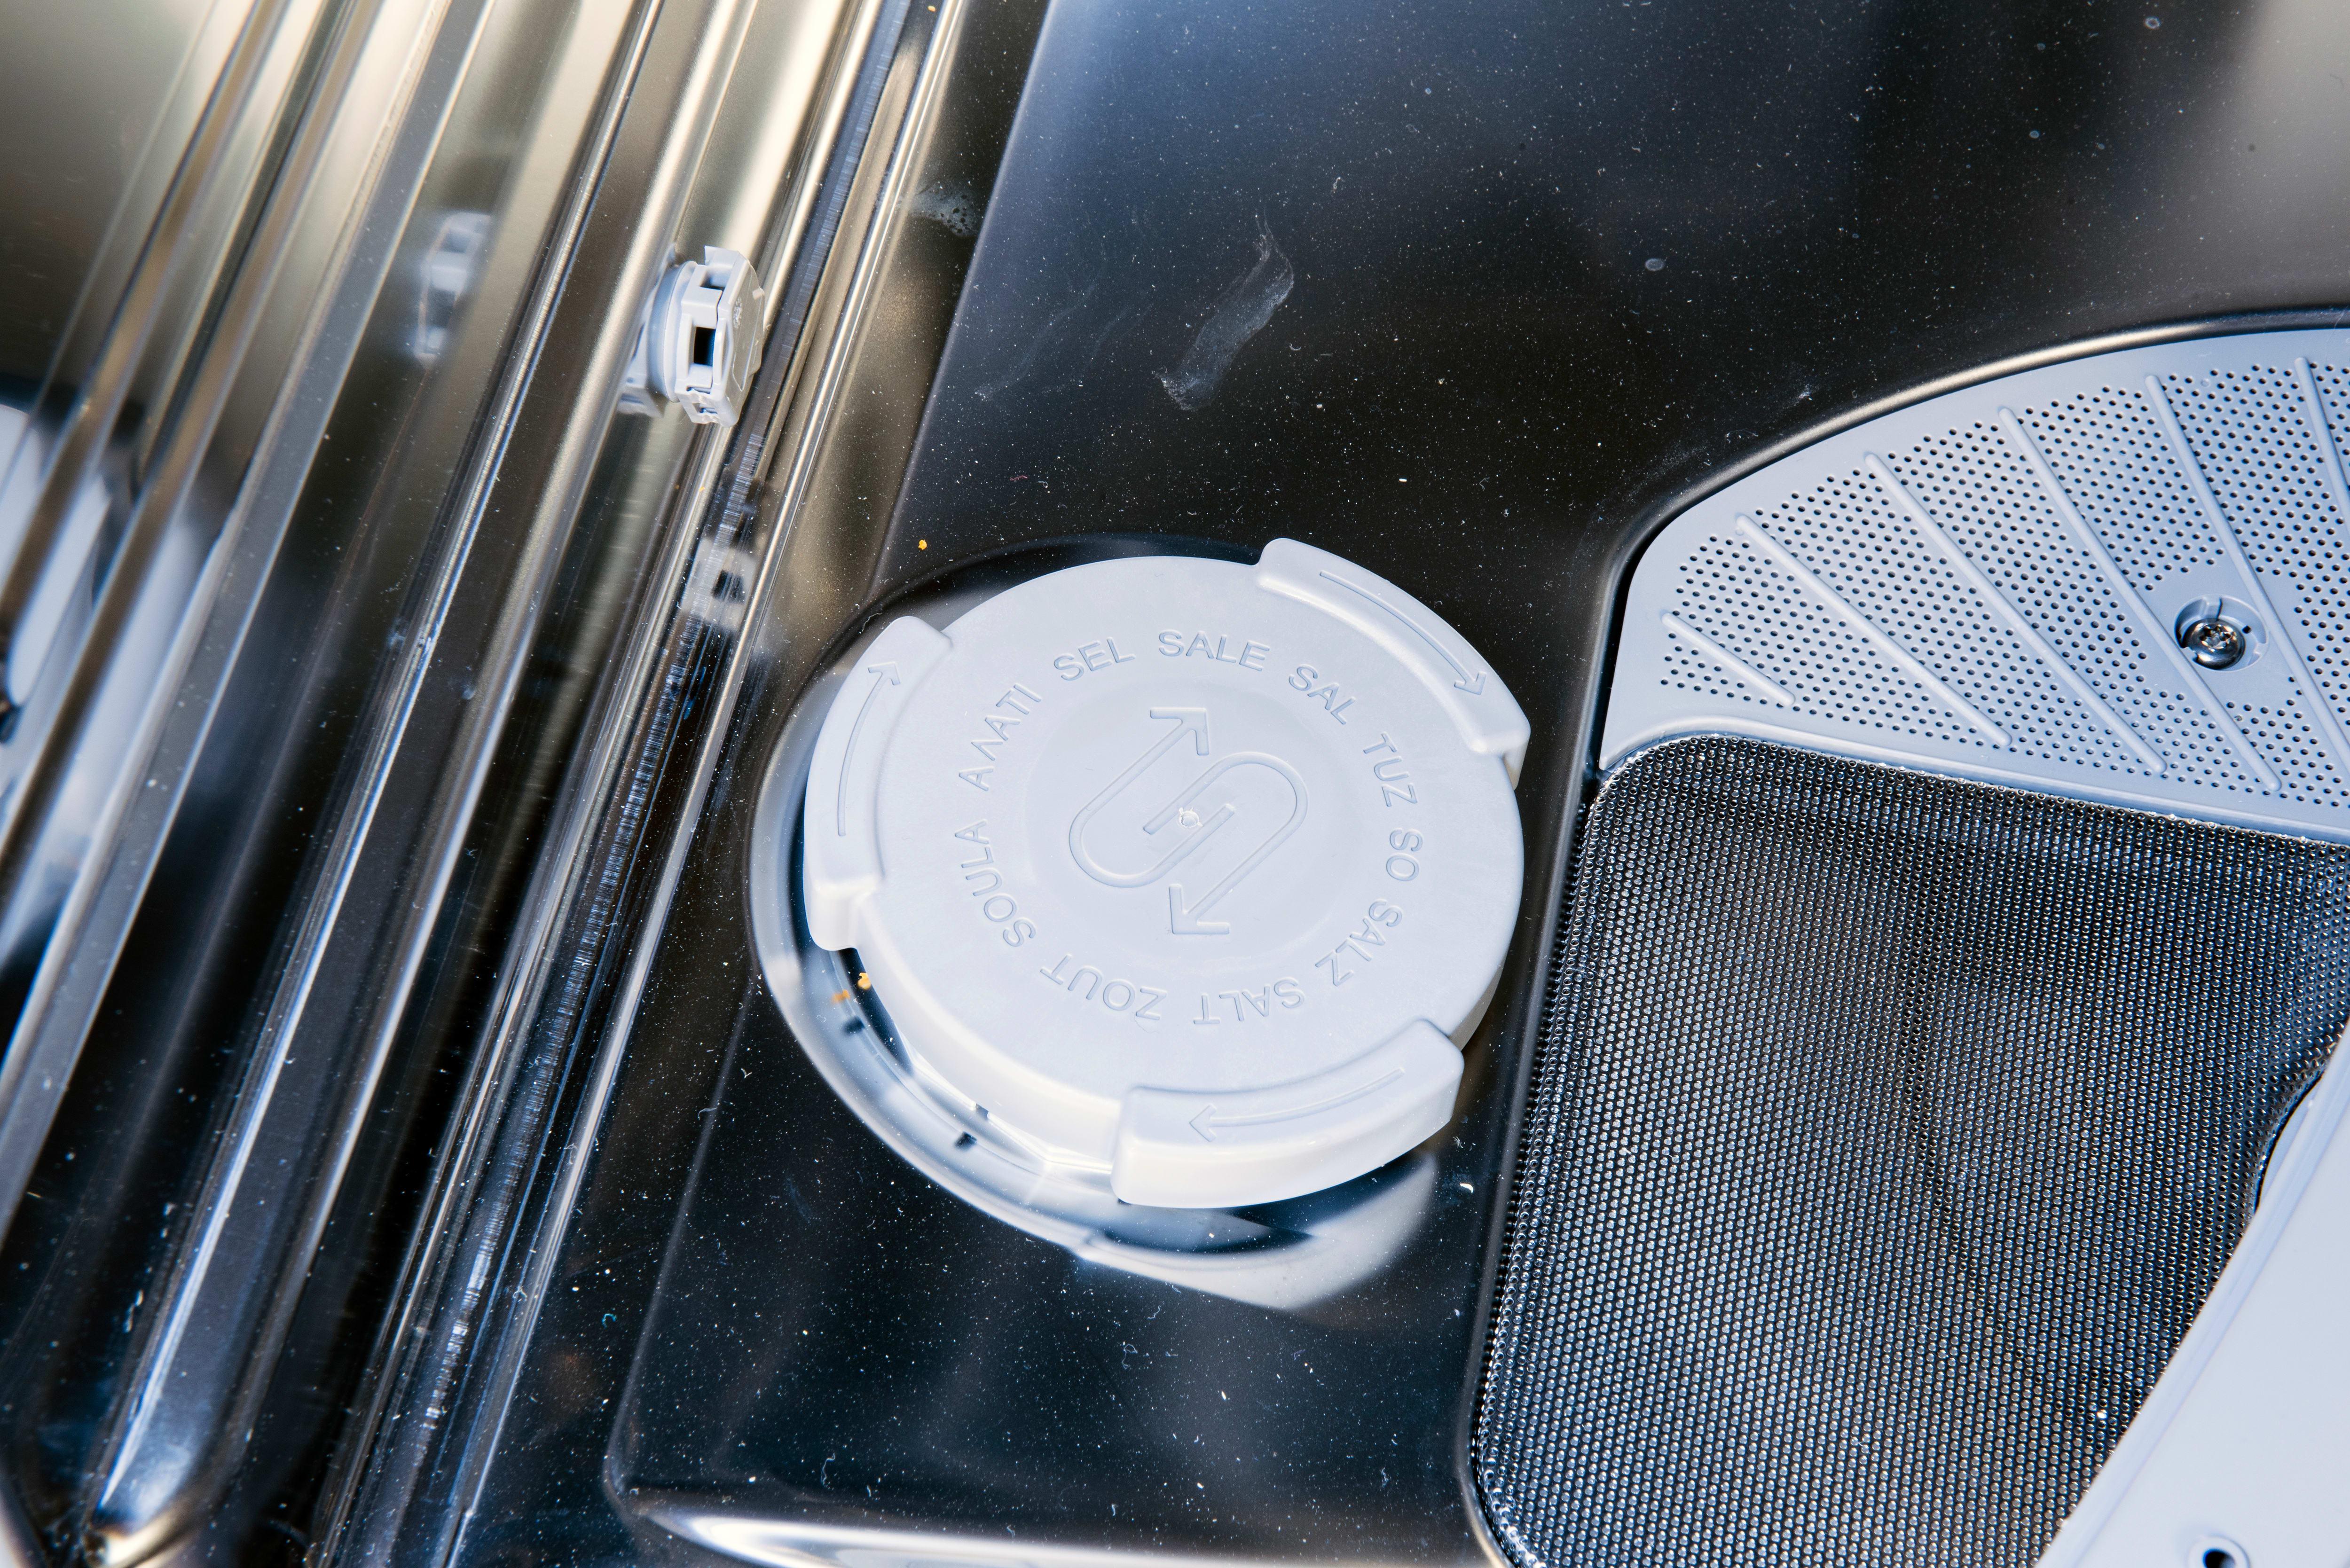 Jenn-Air JDB9600CWX salt dispenser